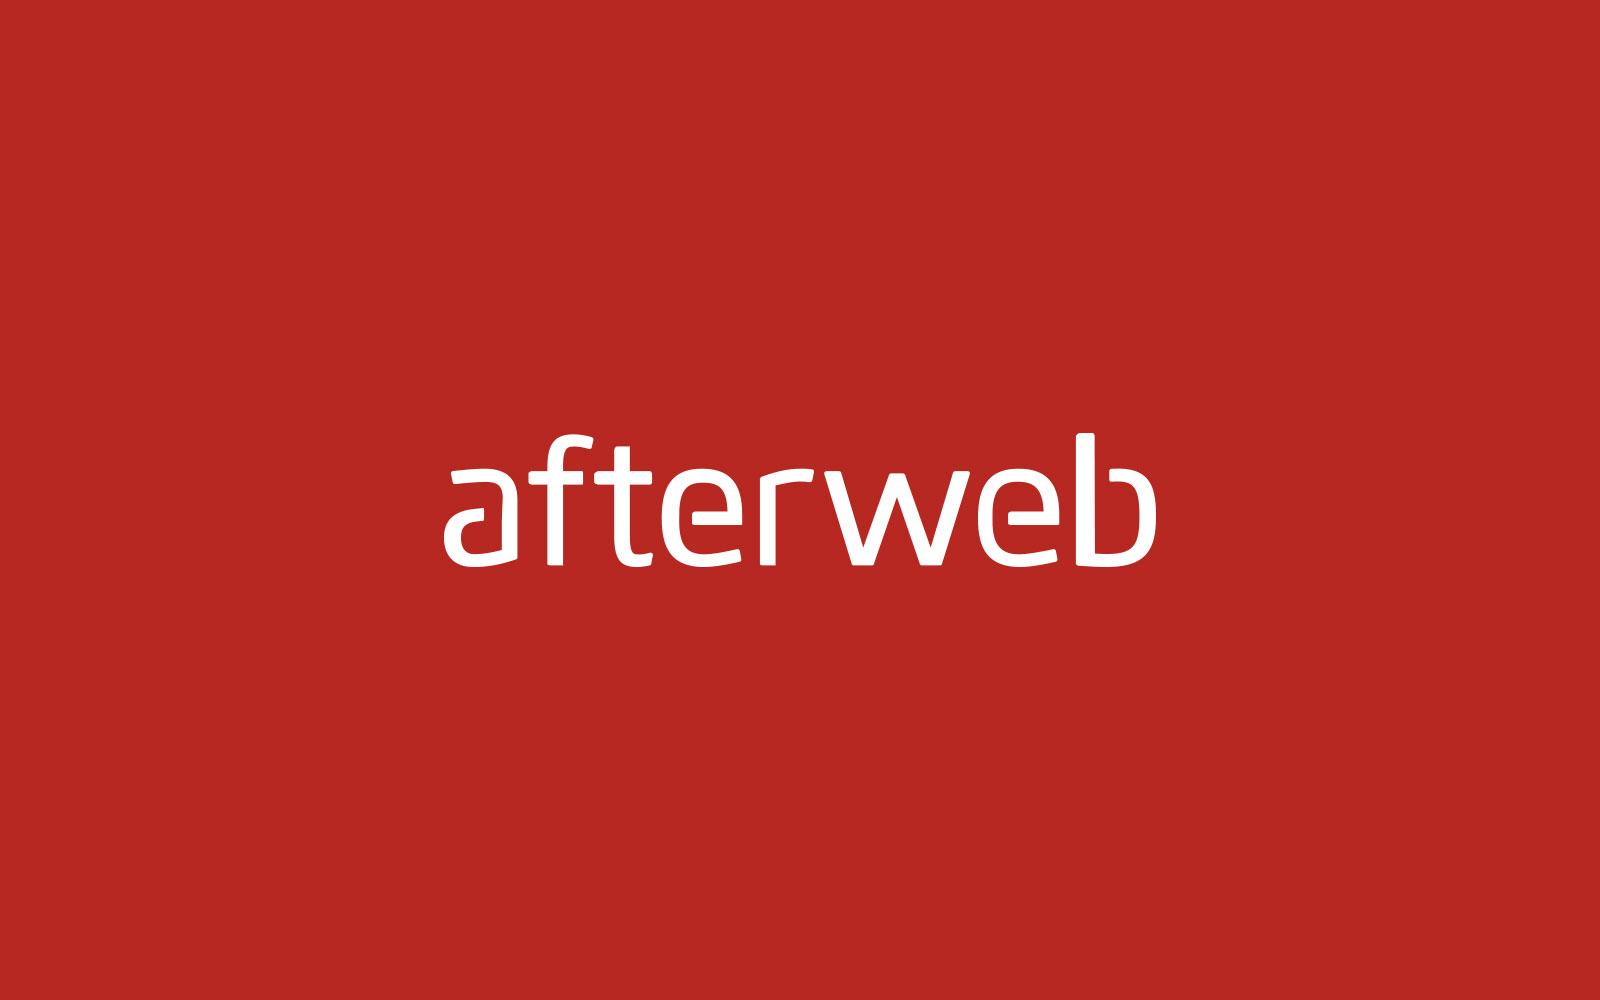 2logo-dla-afterweb-projekt